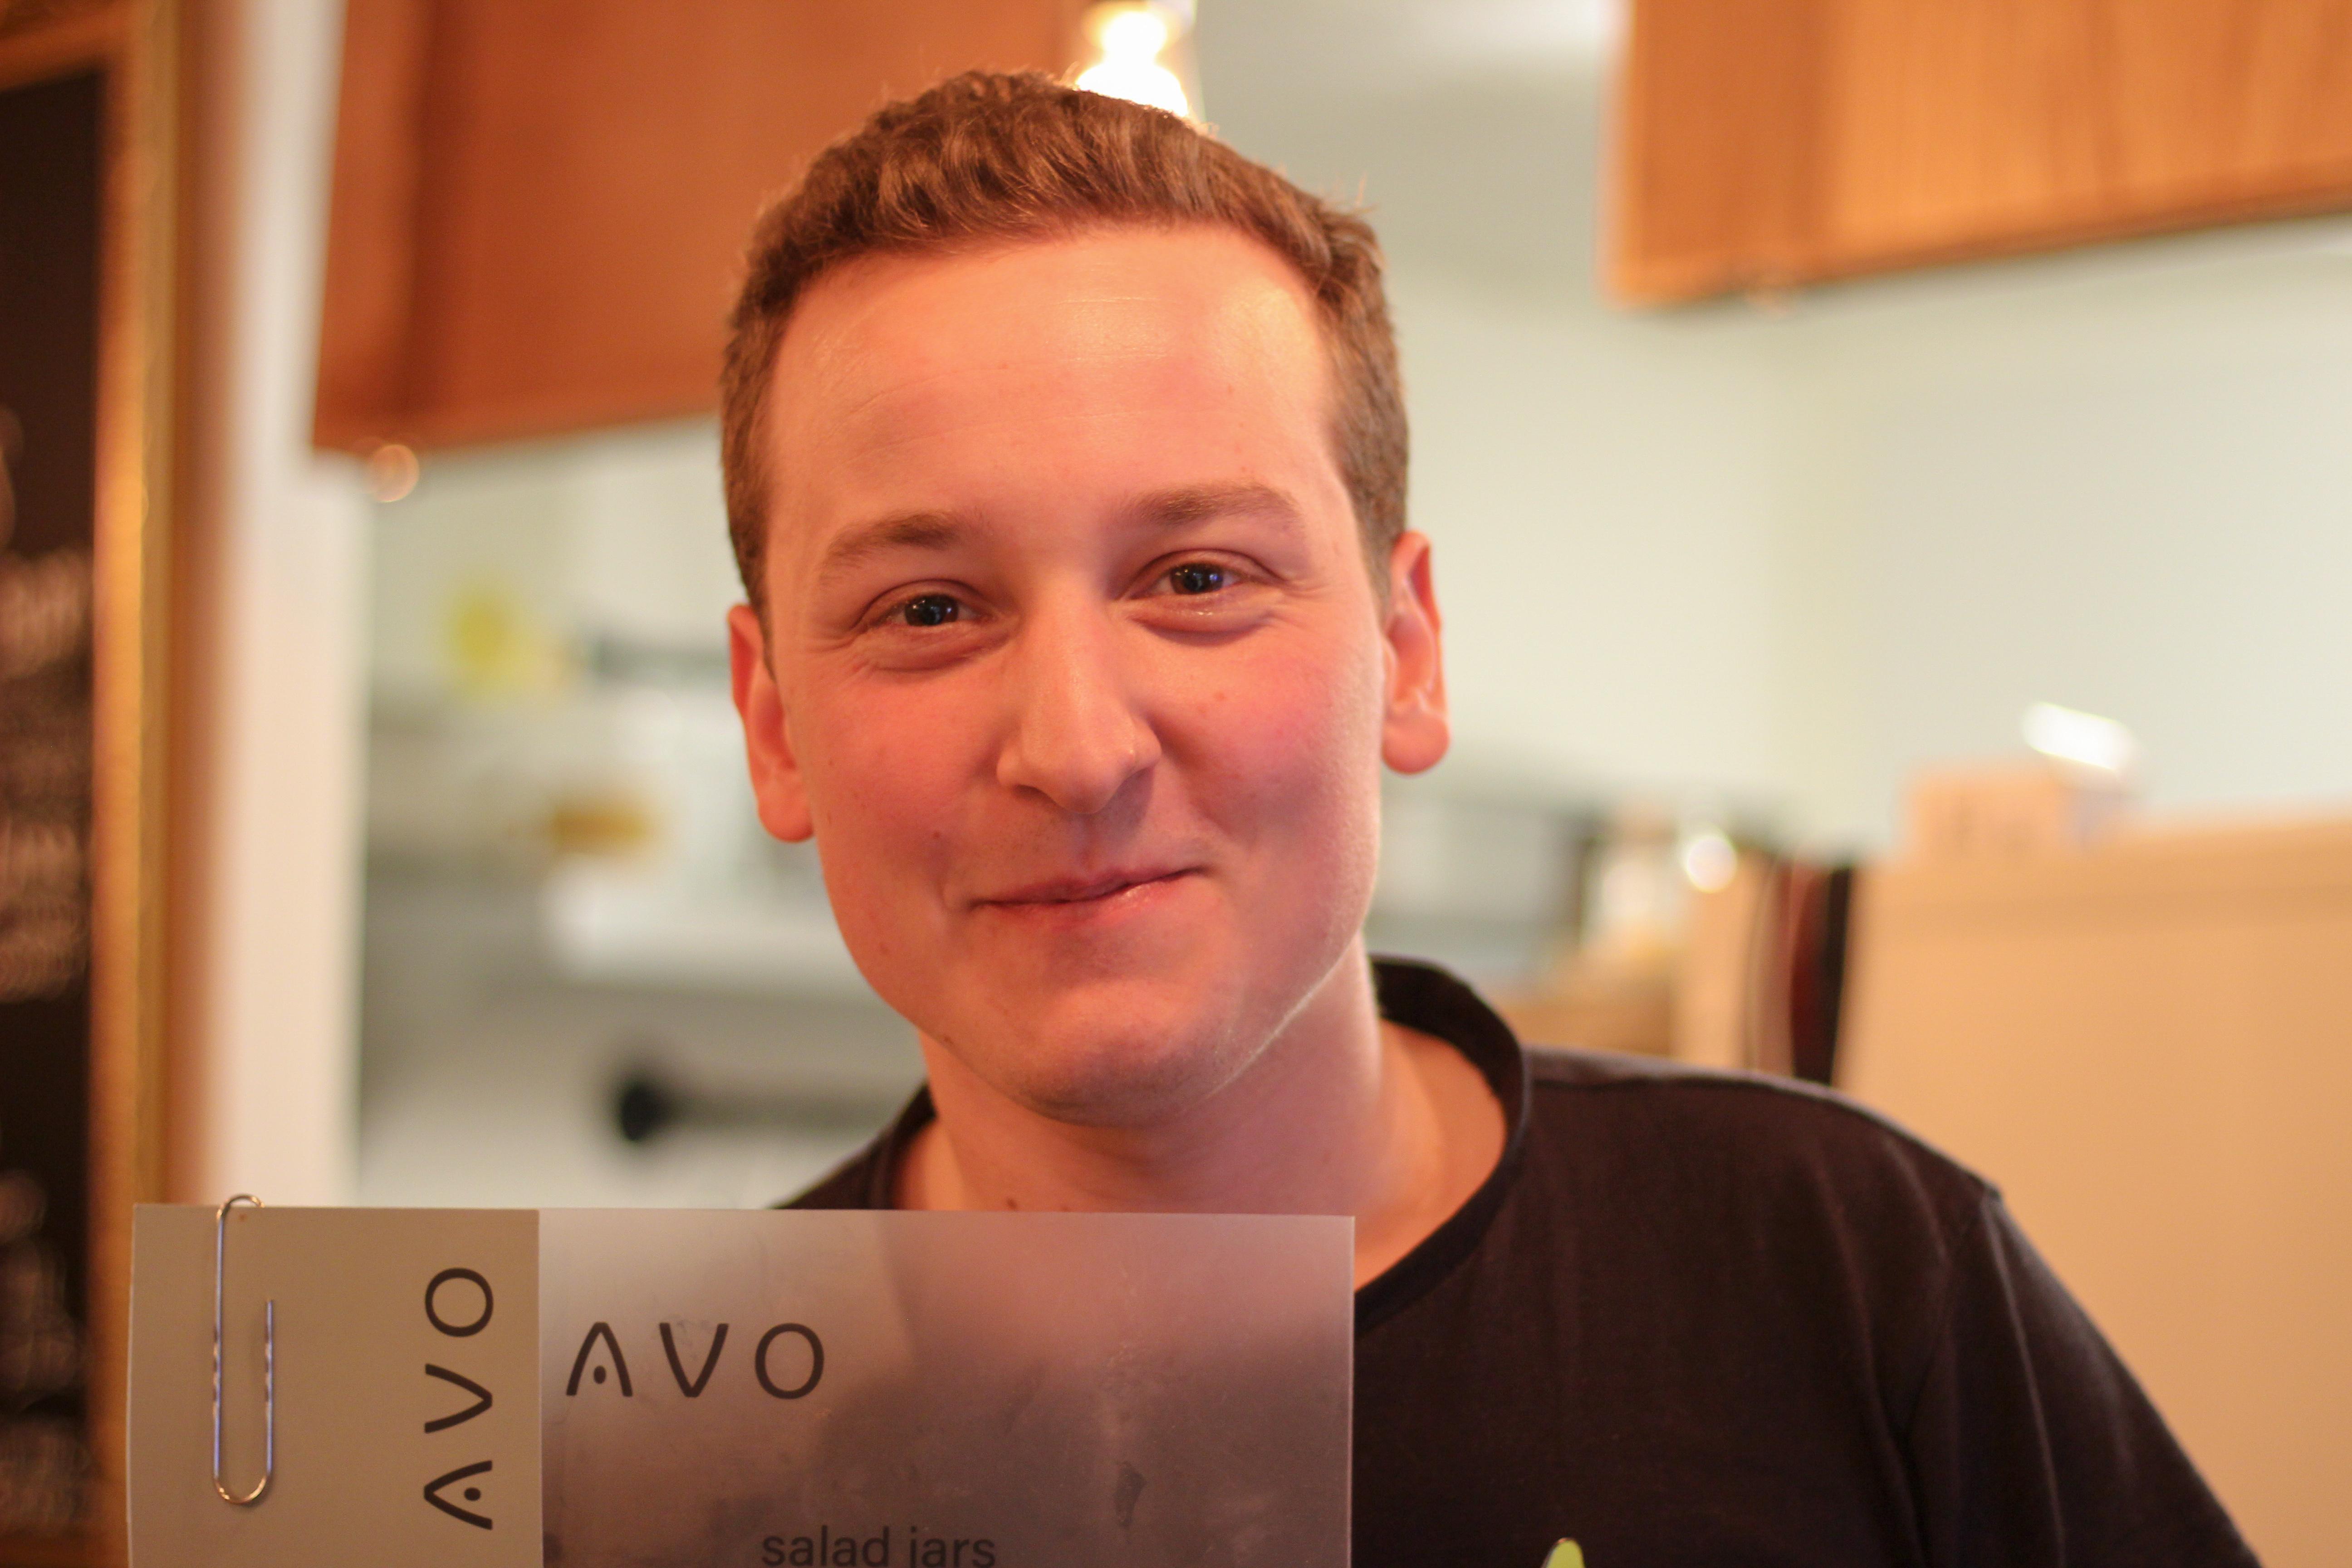 Meet The Locals - AVO